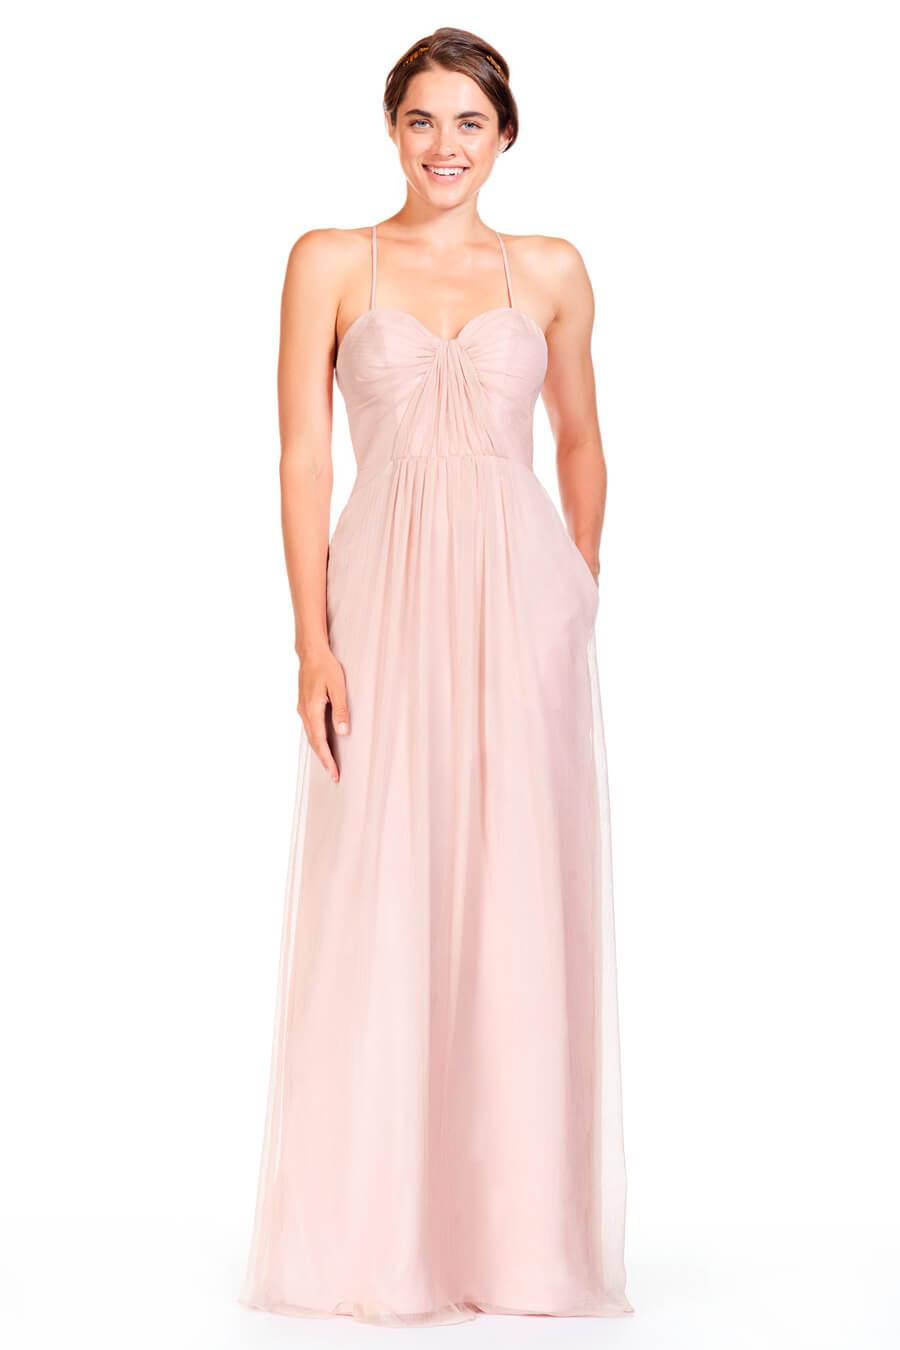 Bari jay bridesmaids bridesmaid dresses prom dresses formal style 1836 ombrellifo Gallery